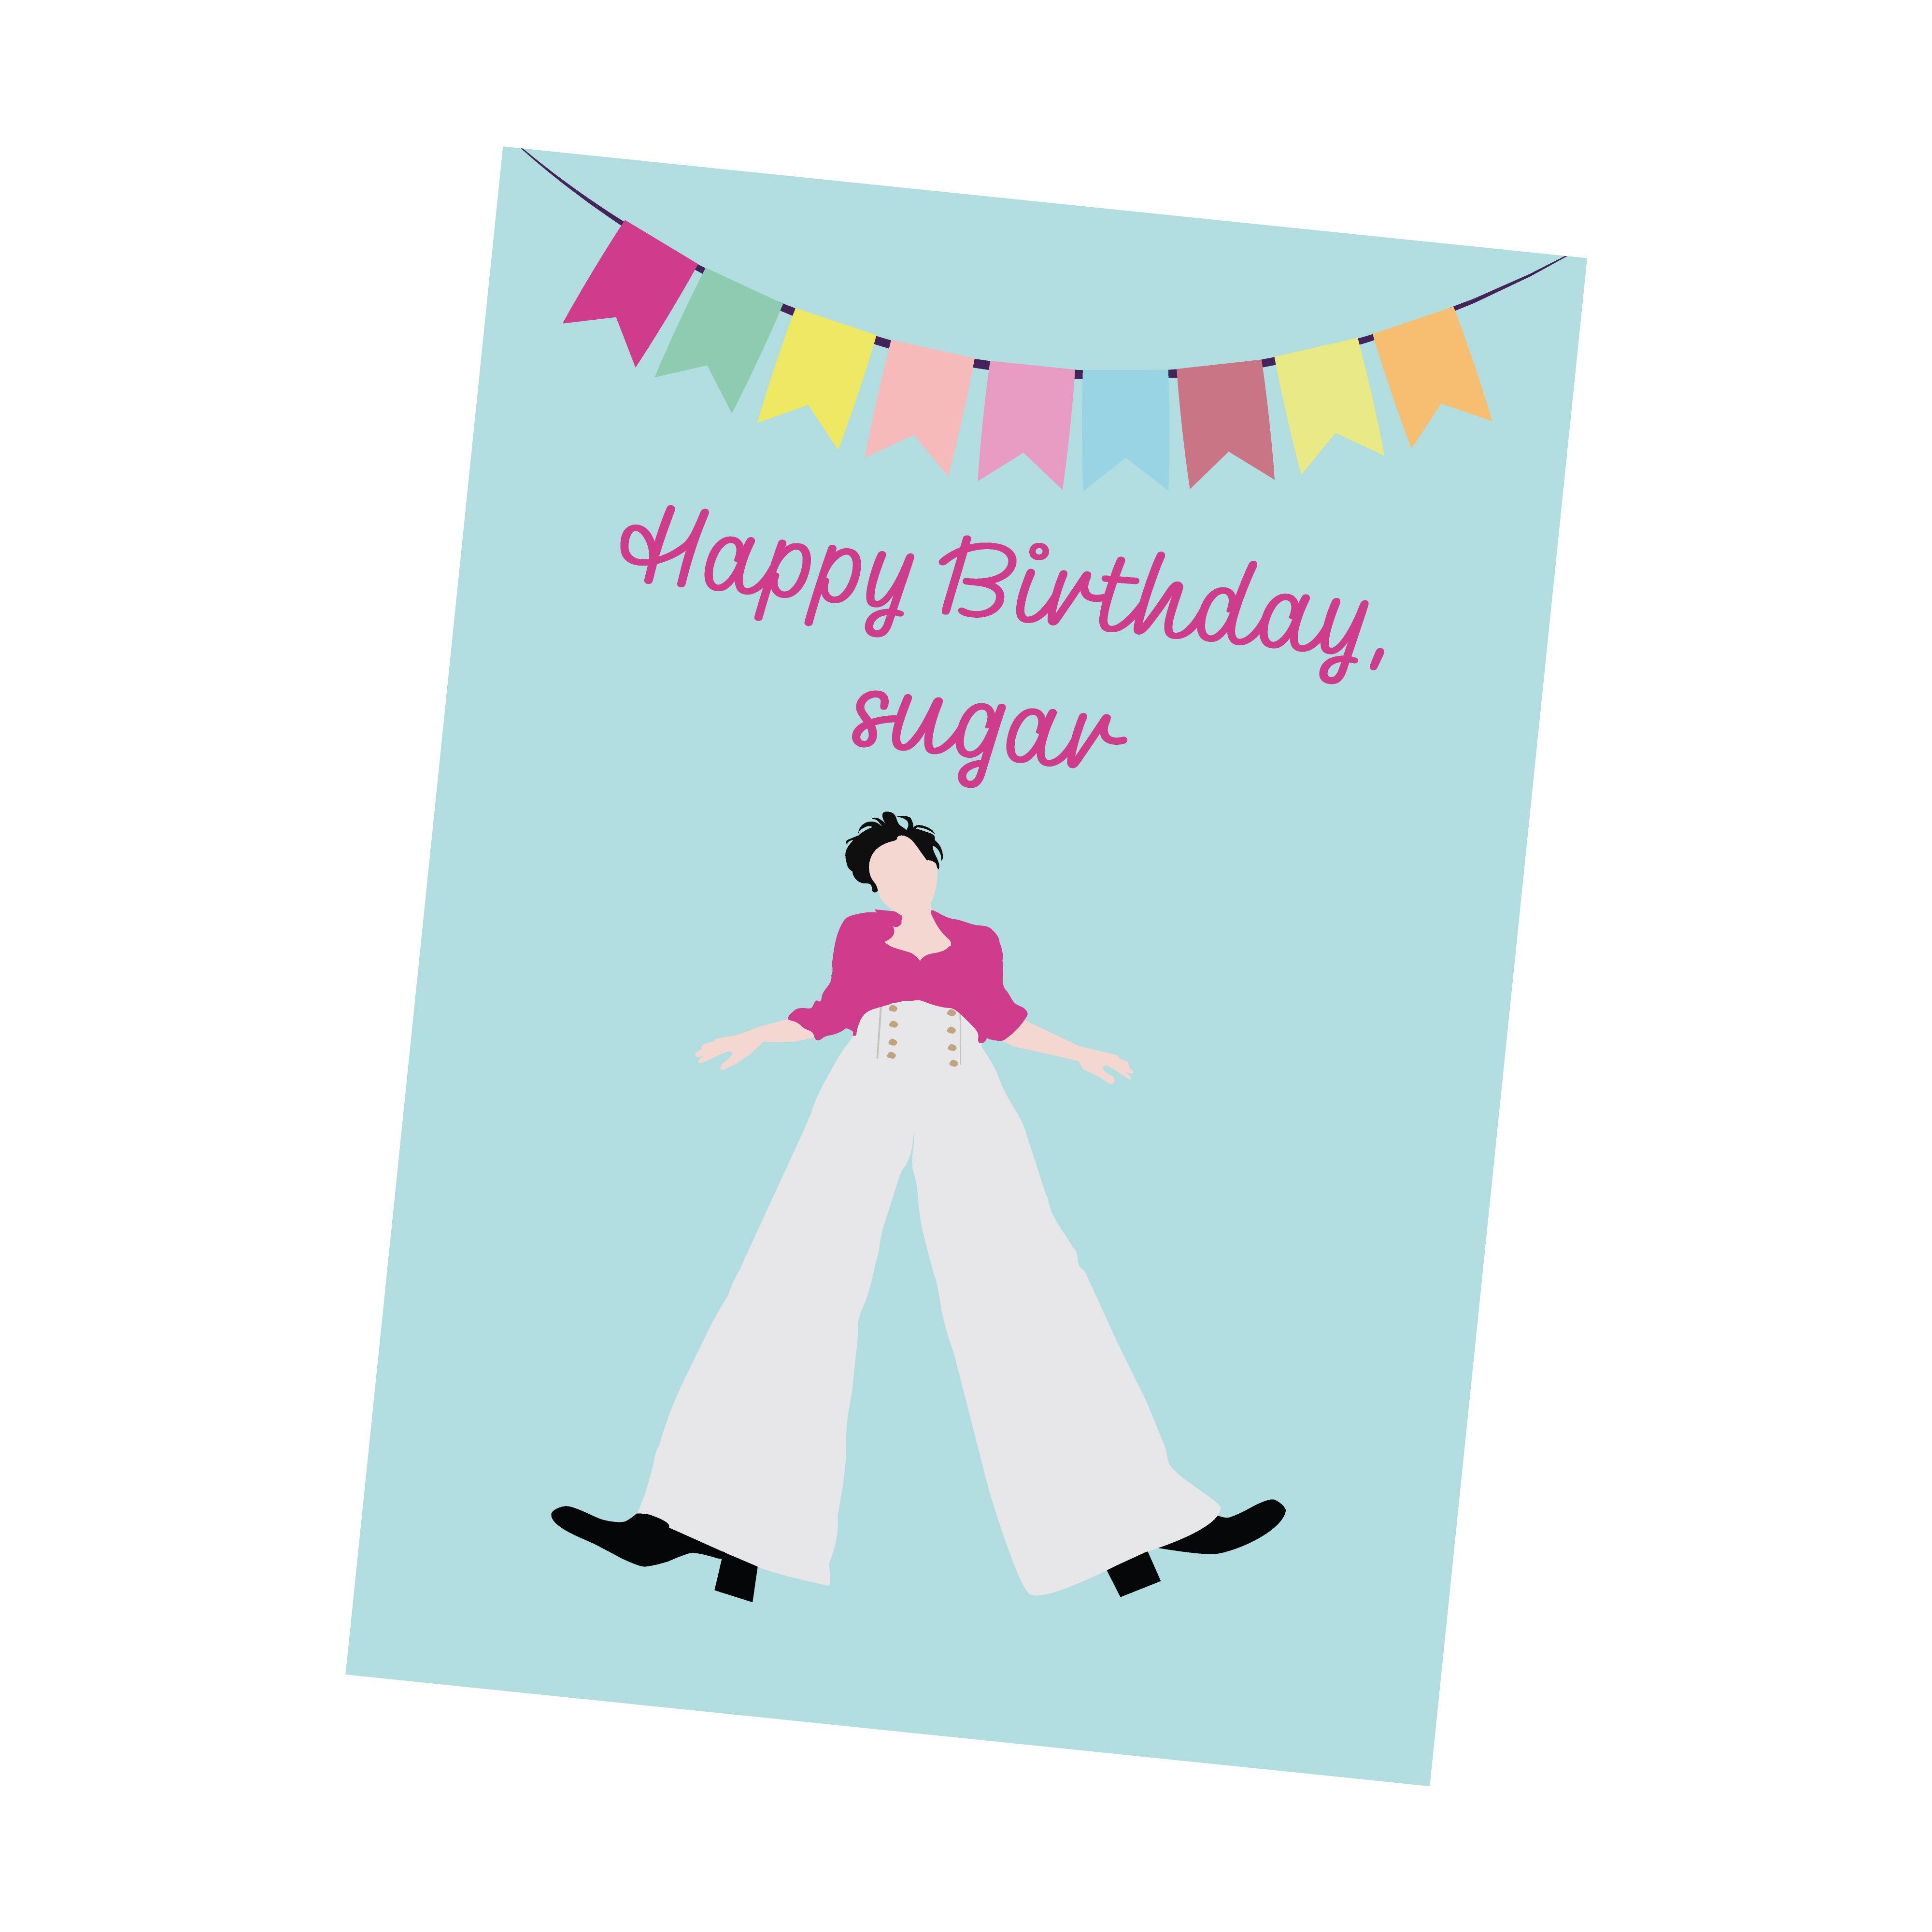 Happy Birthday Sugar Harry Styles Greeting Card Birthday Card Etsy In 2021 Download Birthday Cards Gift Card Printing Birthday Card Printable